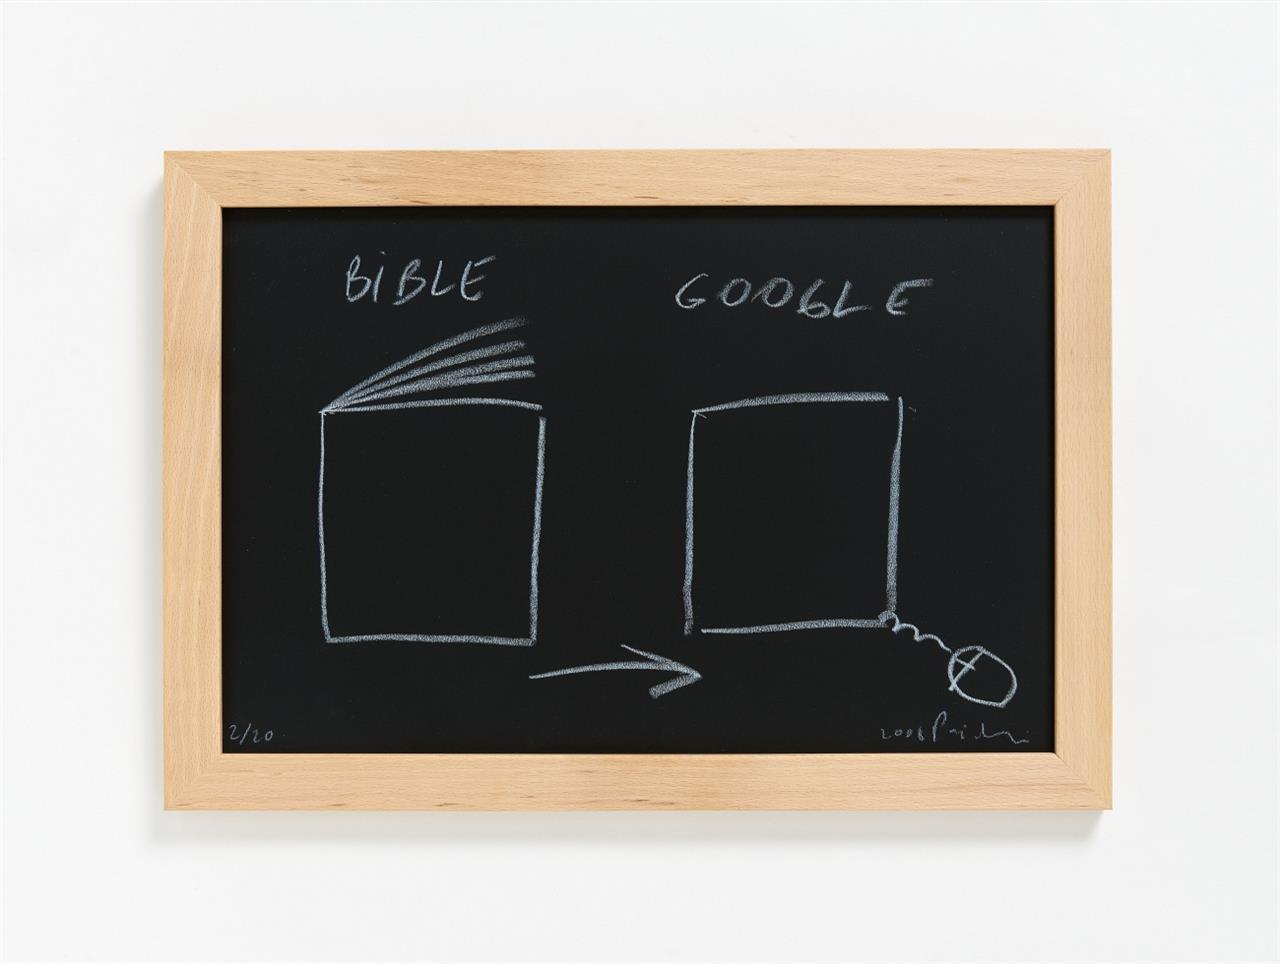 Dan Perjovschi. Bible/Google. 2008. Weiße Kreide auf Tafel, in OrKassette. Signiert. Ex. 2/20.